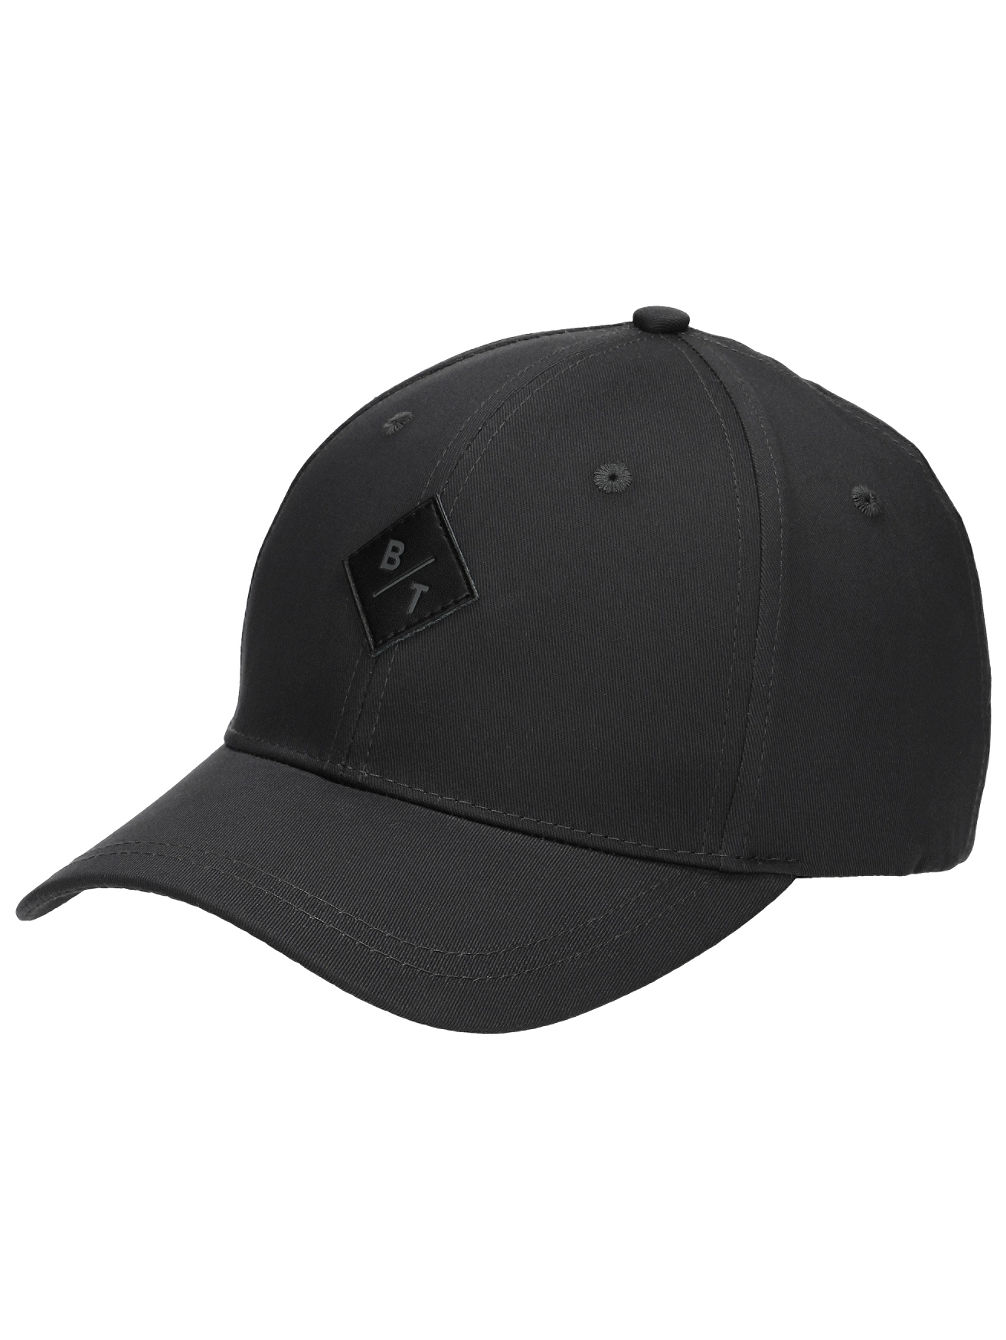 blue-tomato-bt-baseball-cap